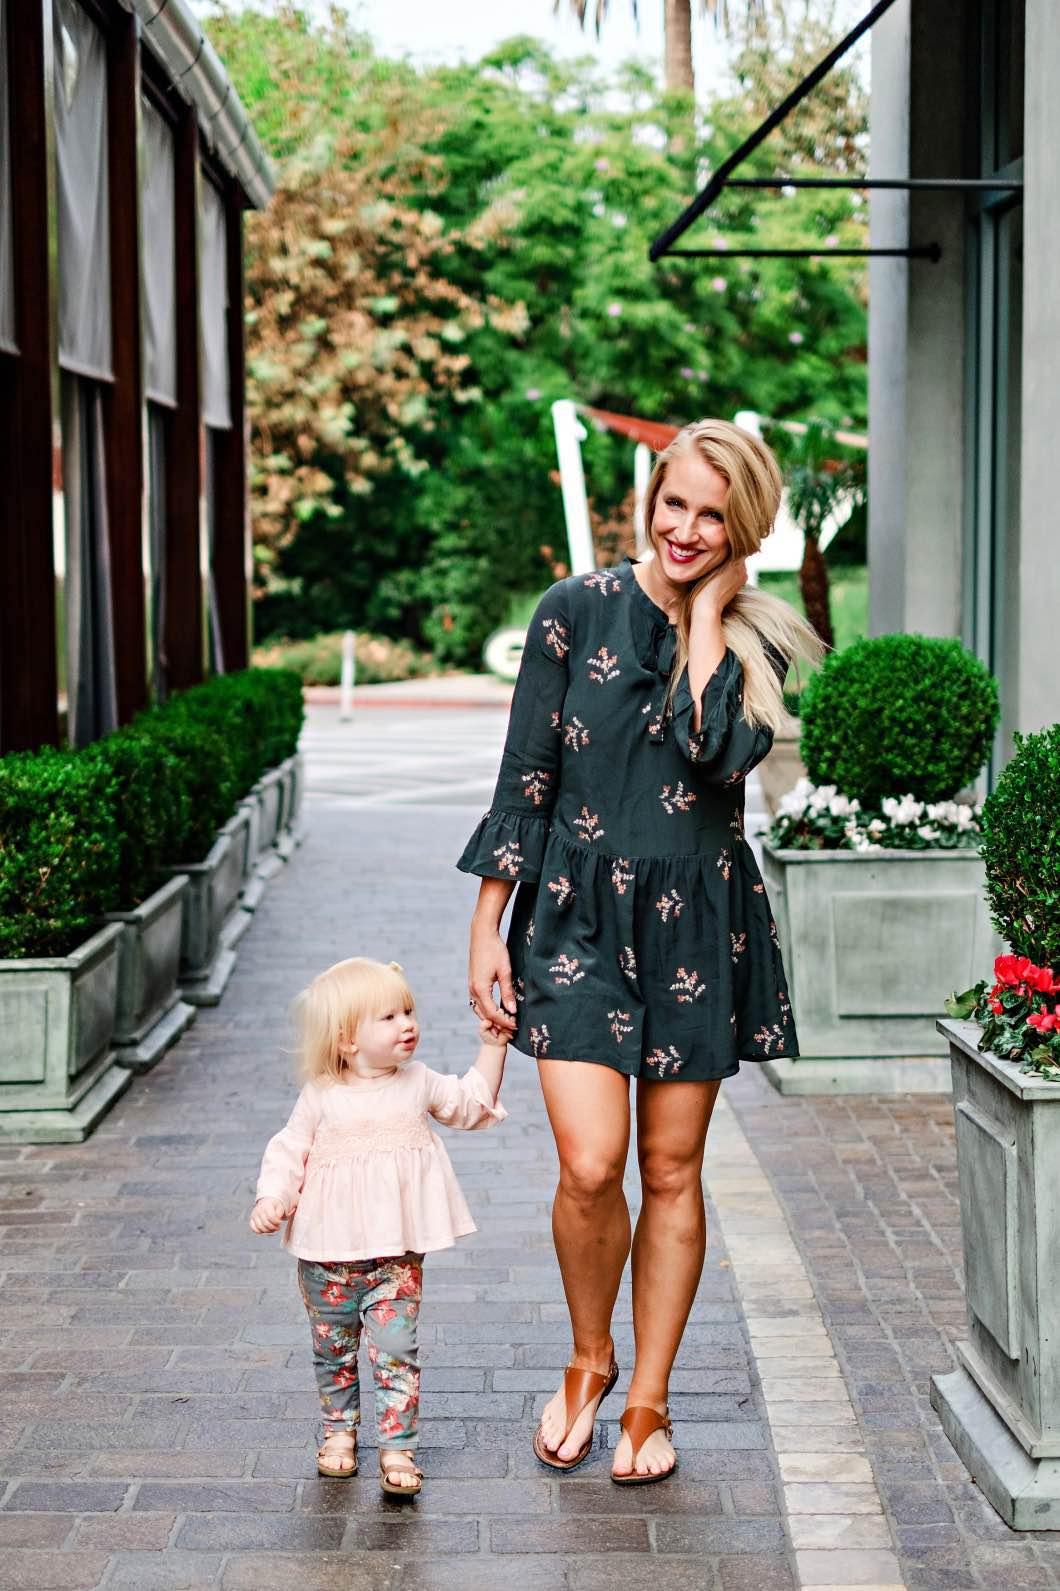 CVS Wellness Clinic: Wellness Care During the Holidays by popular Atlanta blogger Happily Hughes